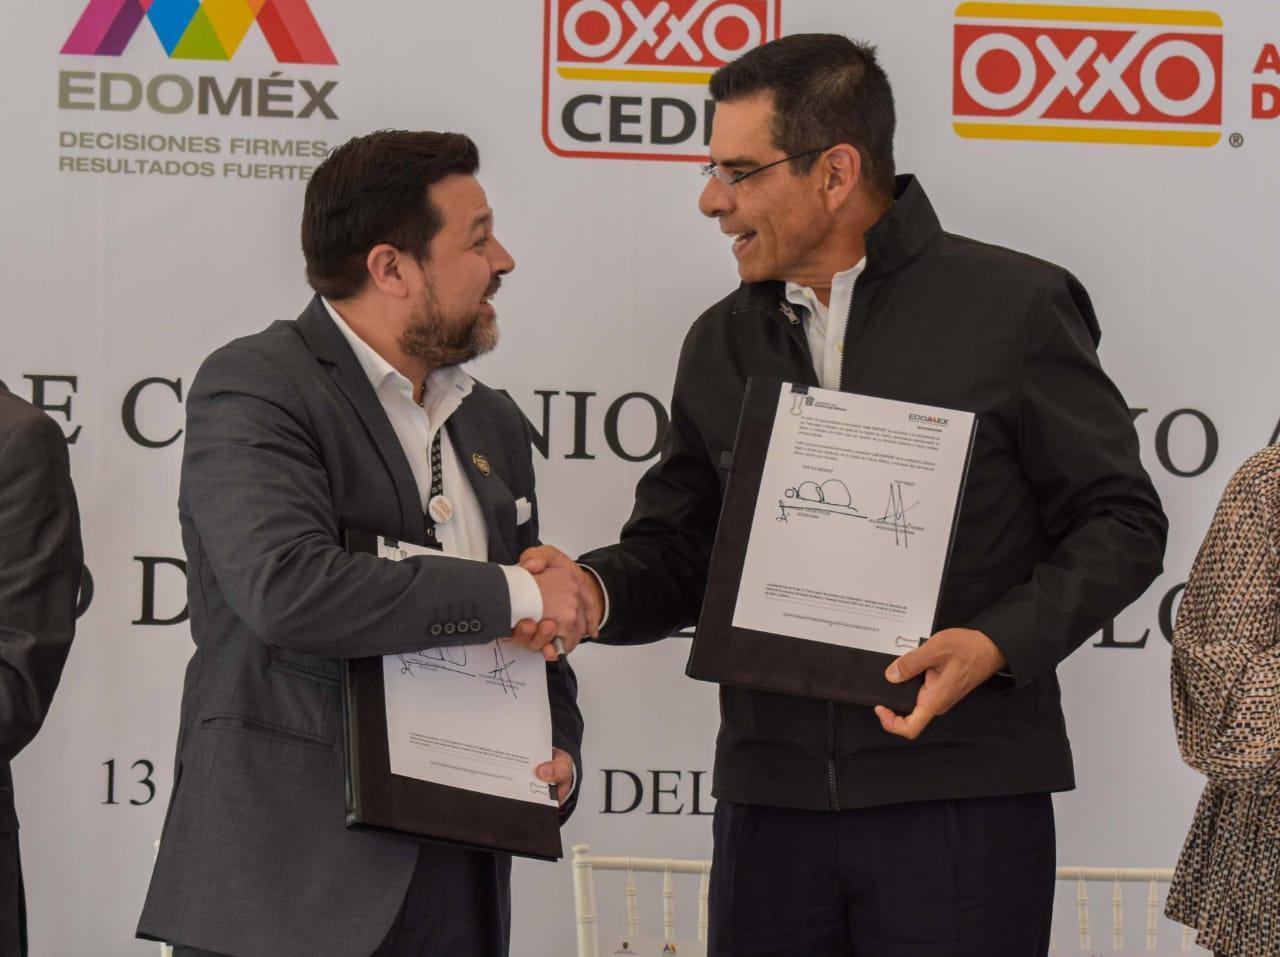 UNEN ESFUERZOS GEM Y GRUPO OXXO PARA COMERCIALIZAR PRODUCTOS MEXIQUENSES